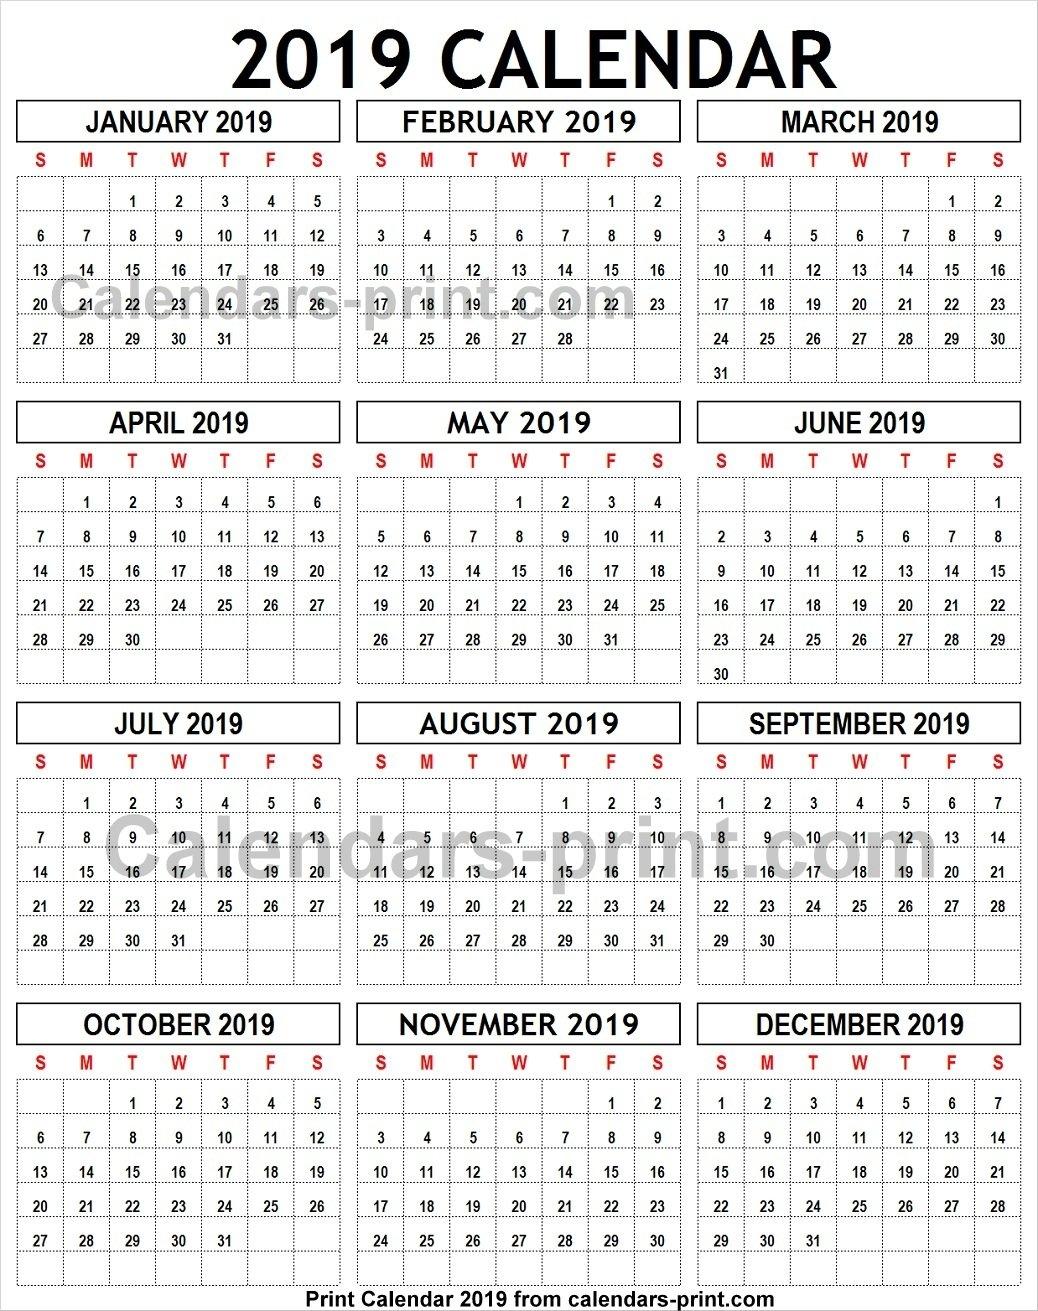 2019 Calendar To Print Template With Notes | Holidays 2019 Calendar 8 1/2 X 11